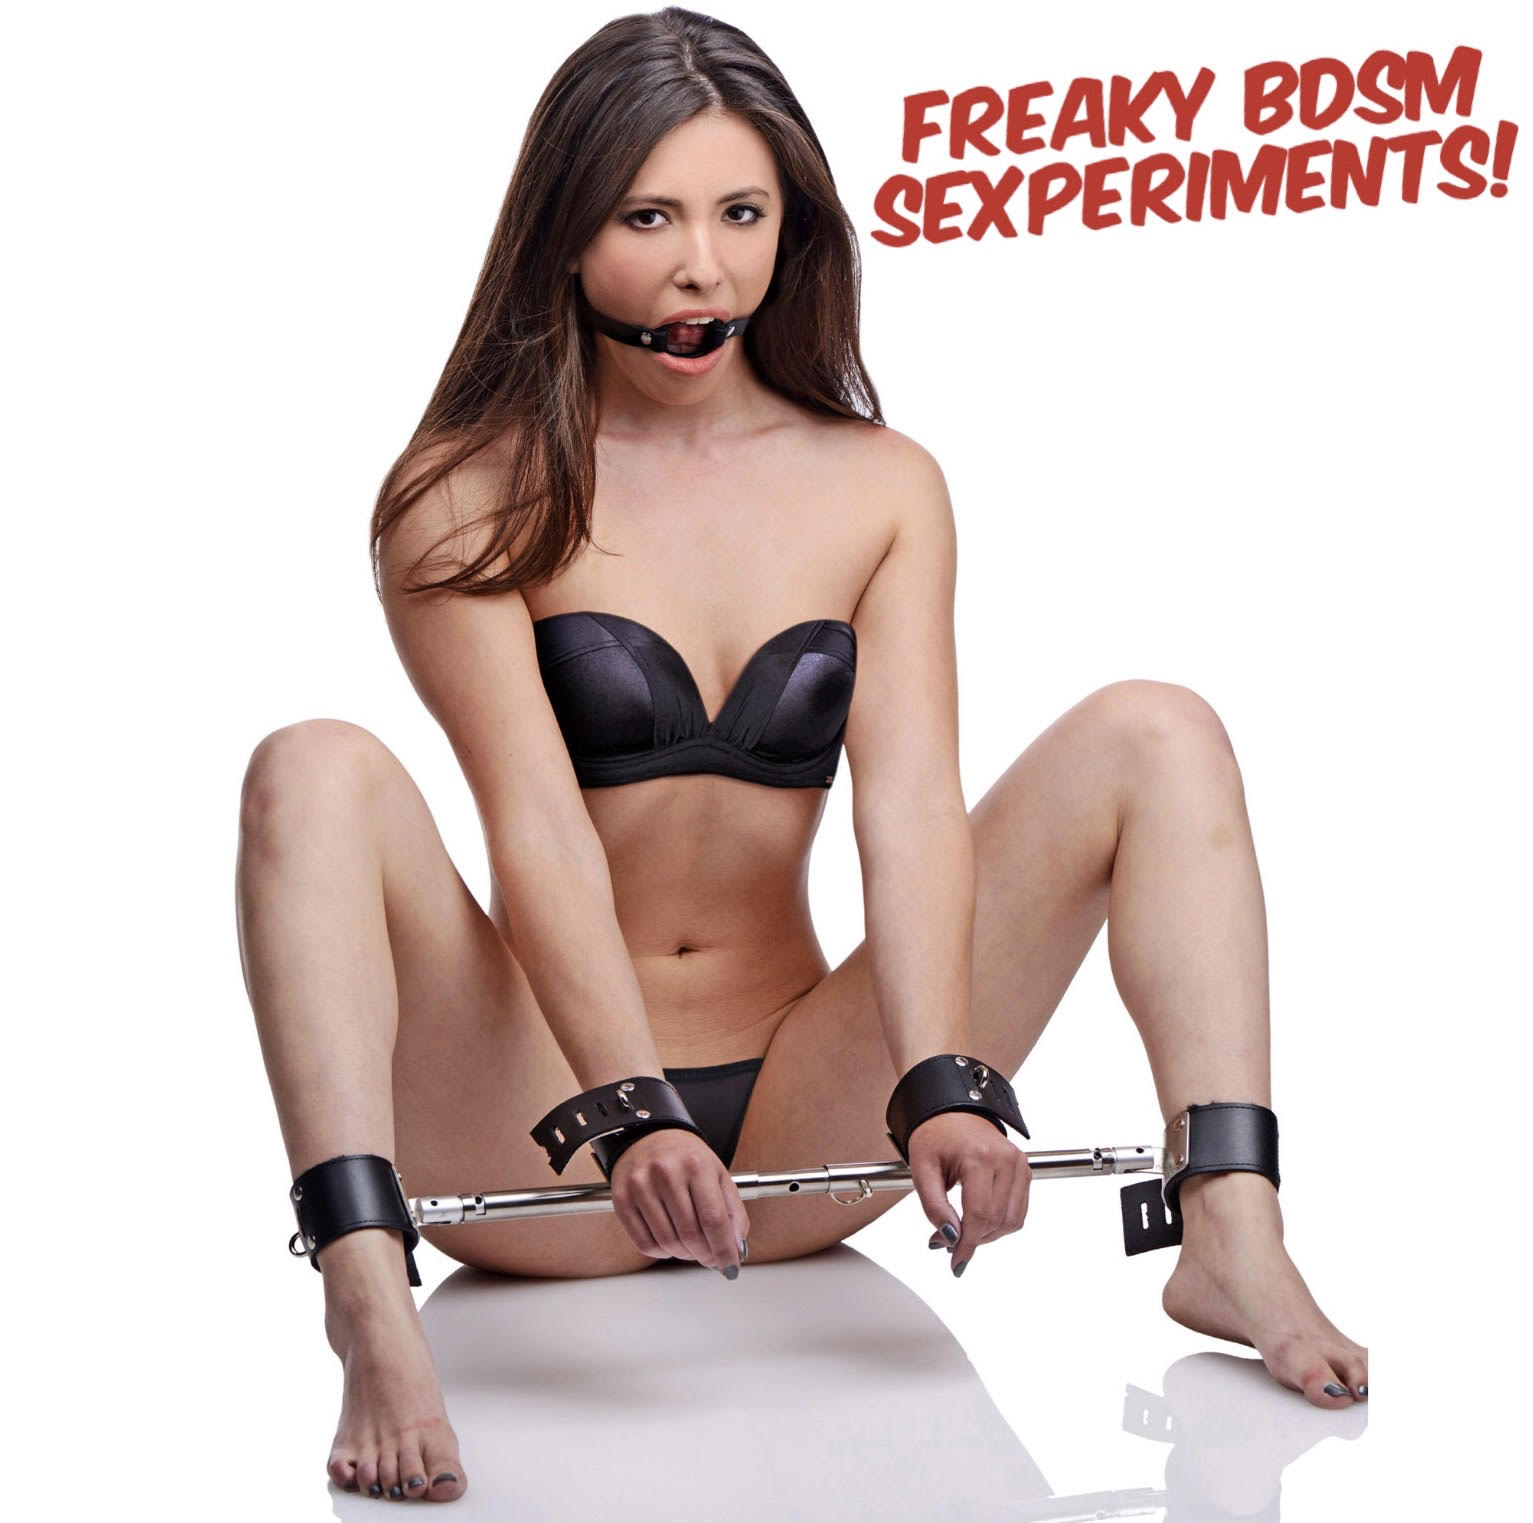 Freaky BDSM Sexperiments Makes Quarantine Fun33